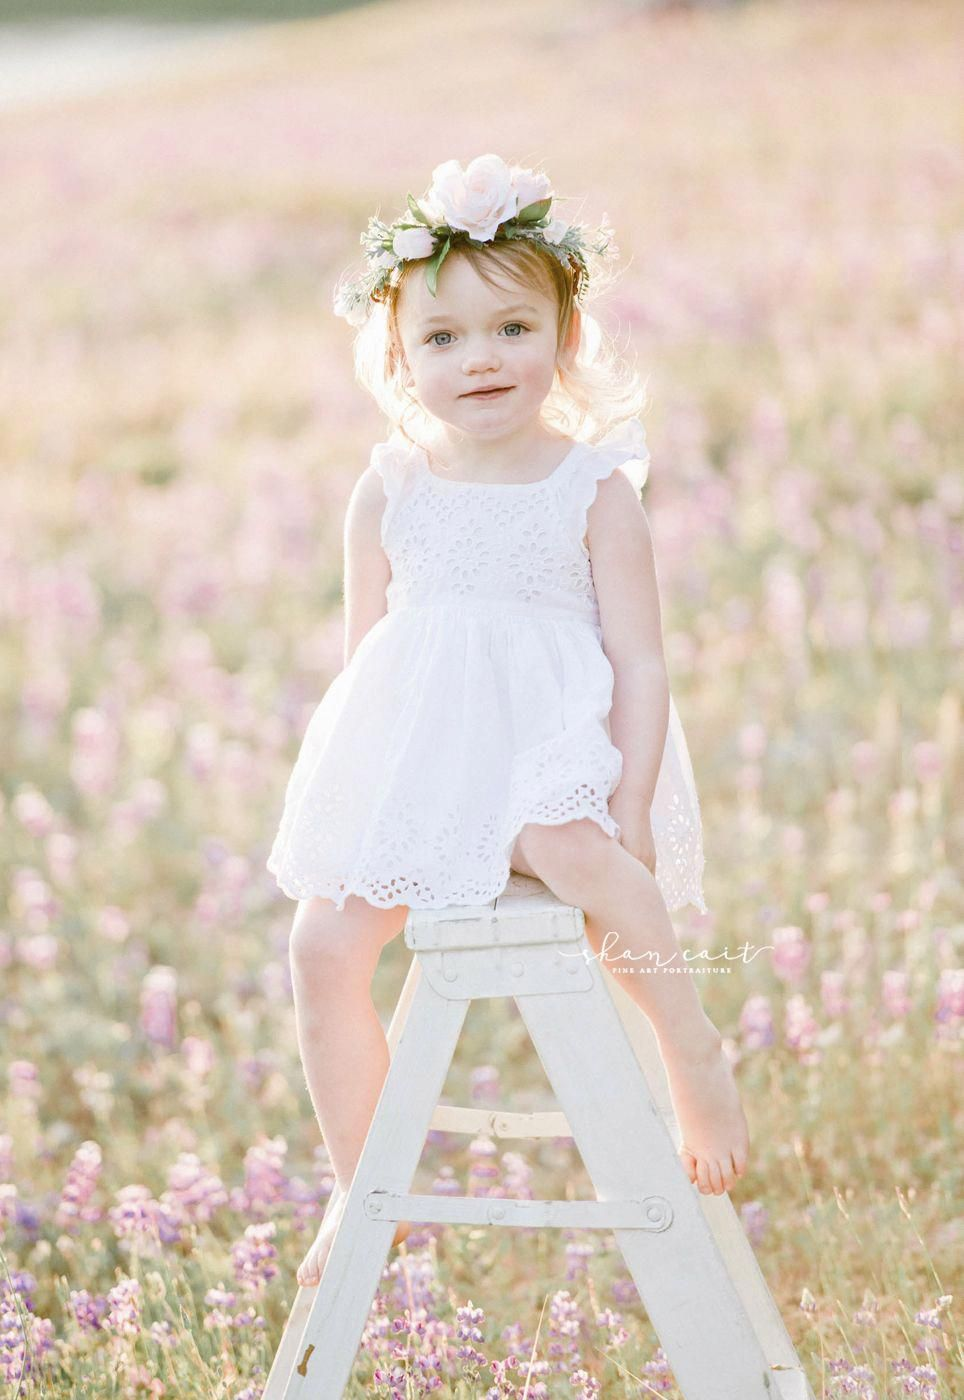 childhood portrait, shan cait photography, little girl